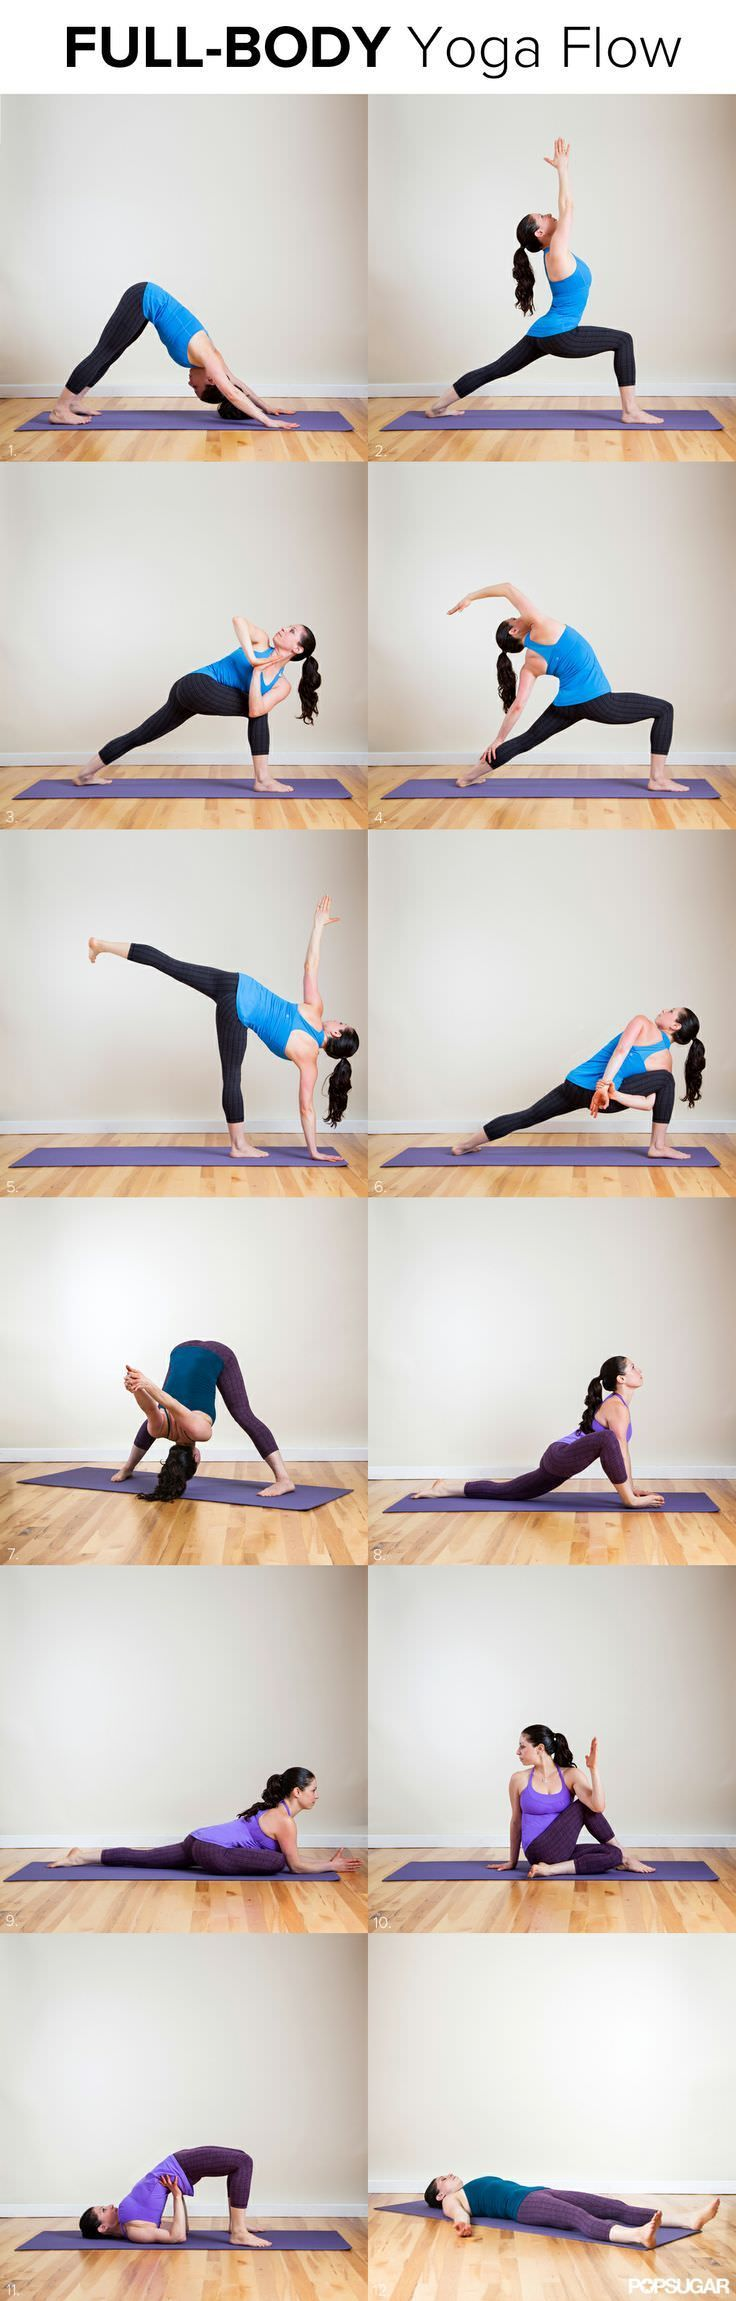 Downward dog pose is helpful for strengthening your bones